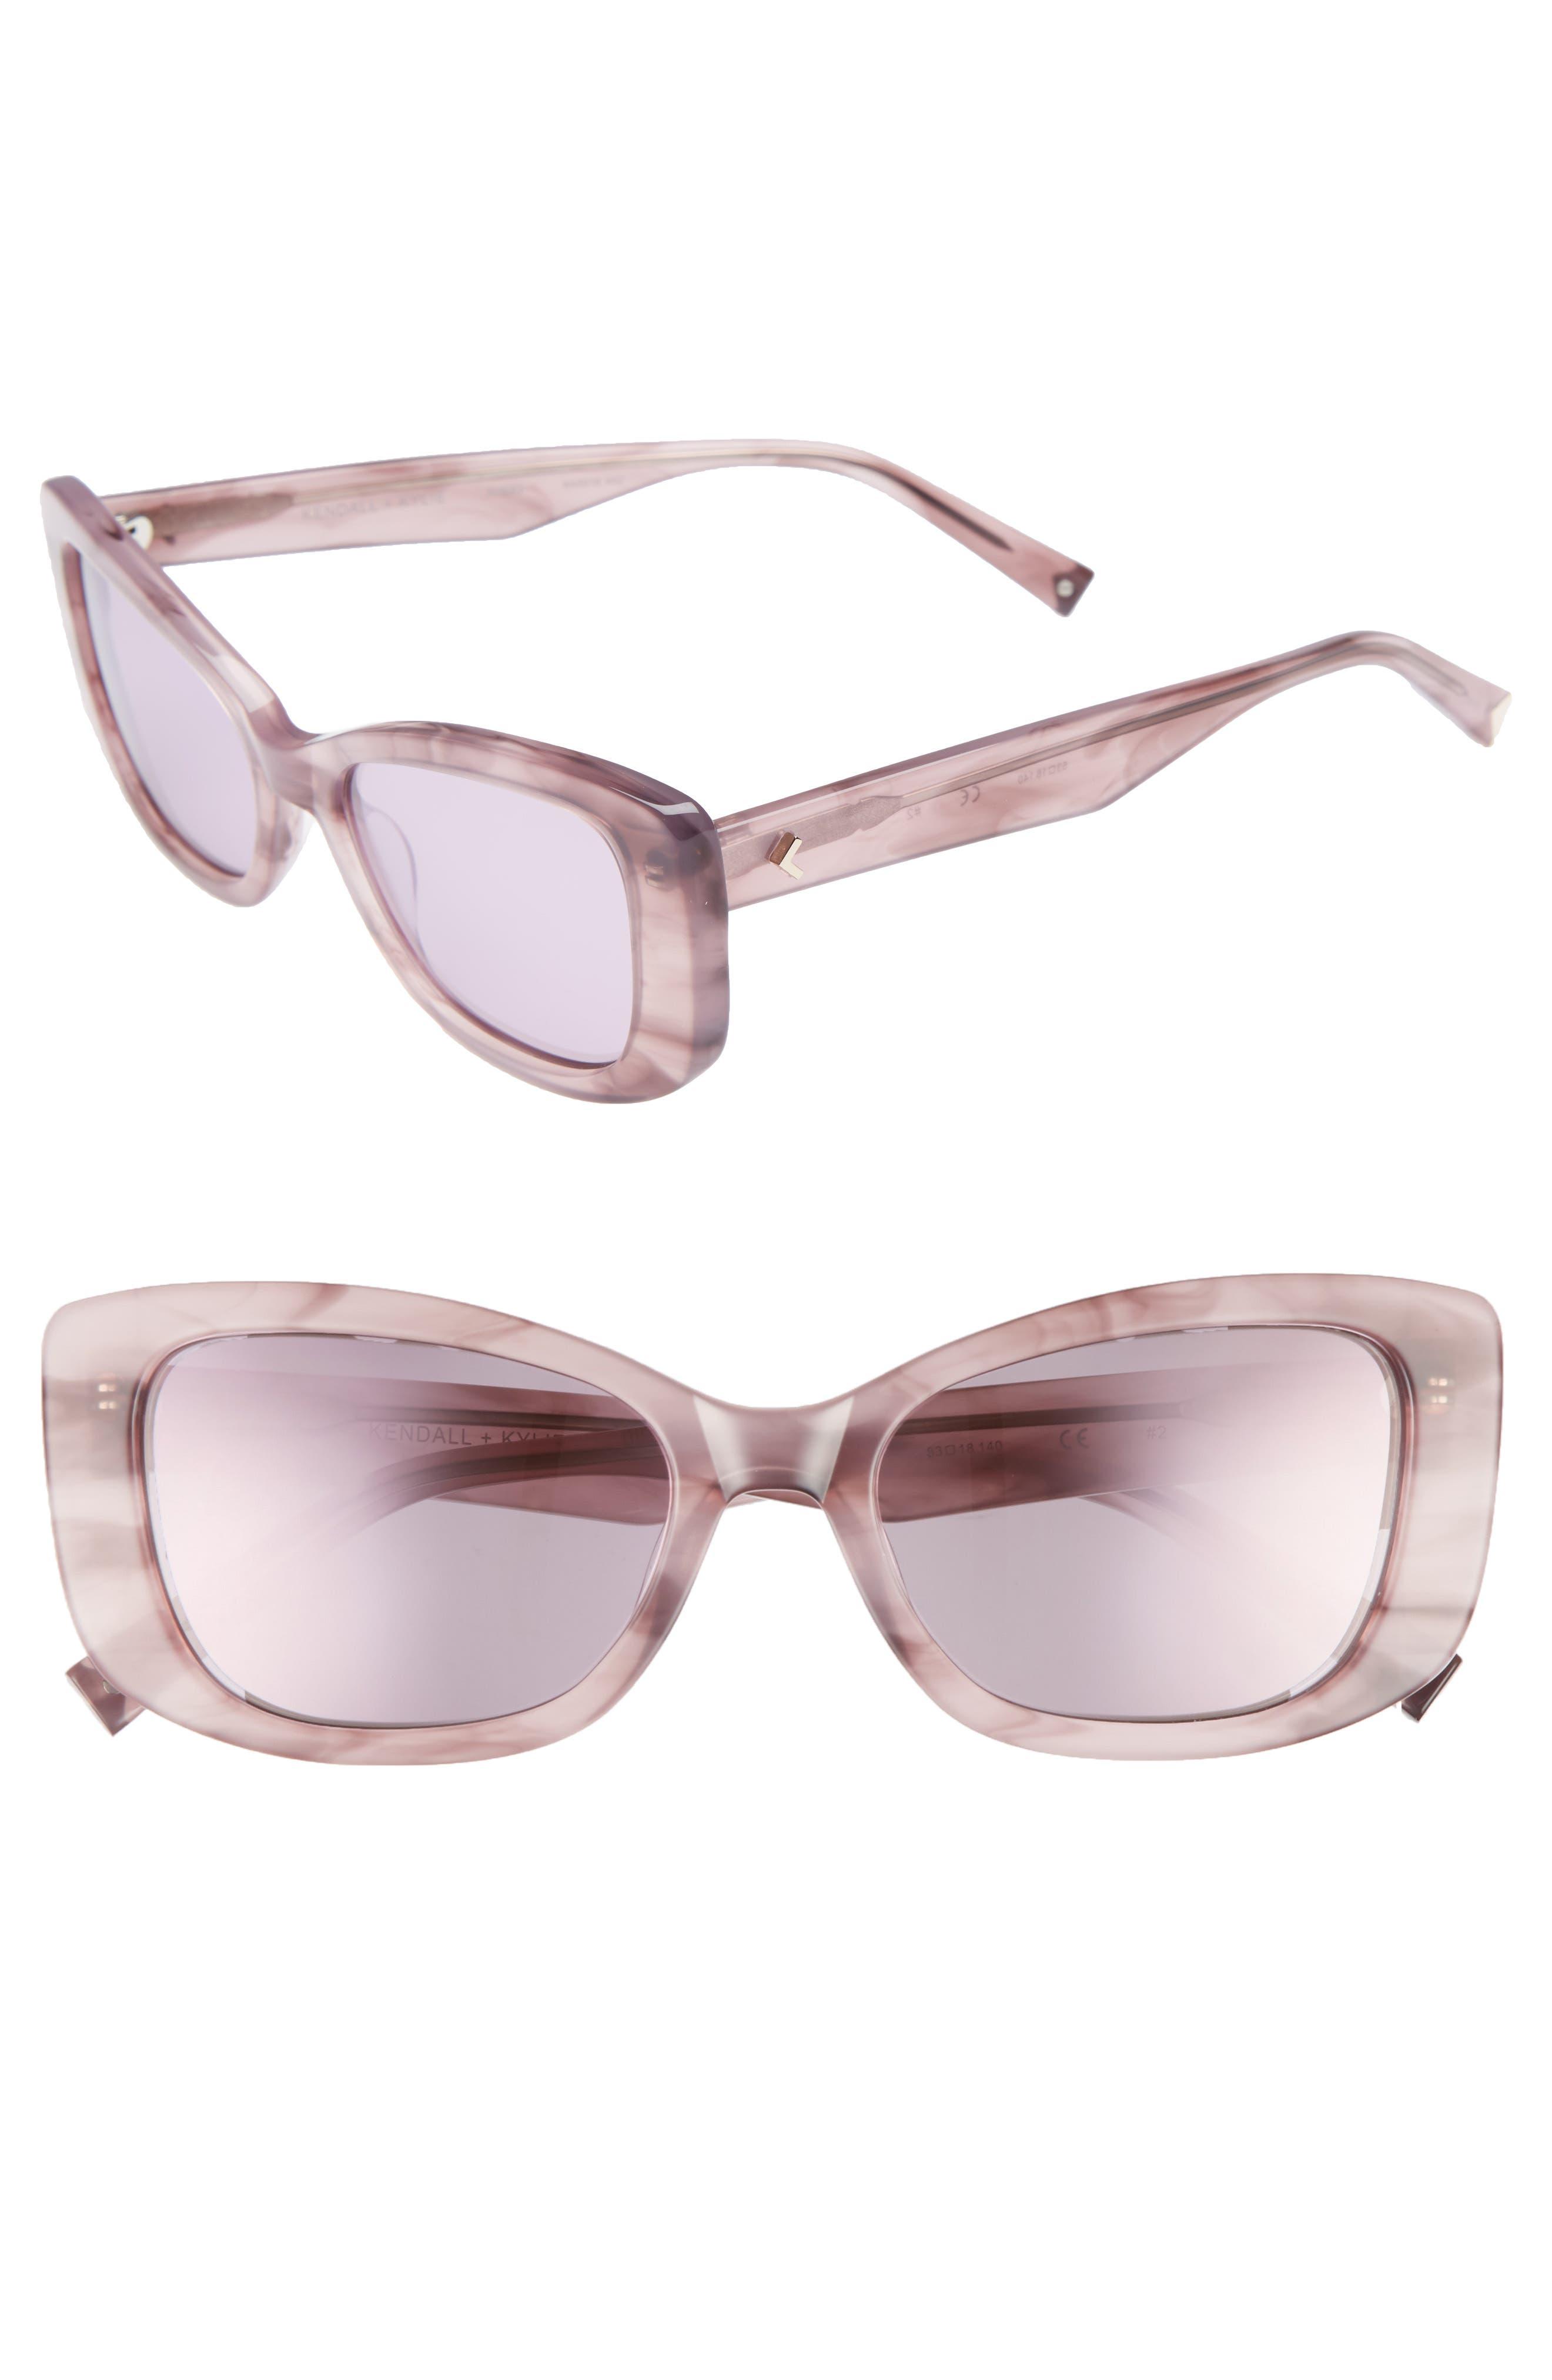 Main Image - KENDALL + KYLIE 53mm Cat Eye Sunglasses